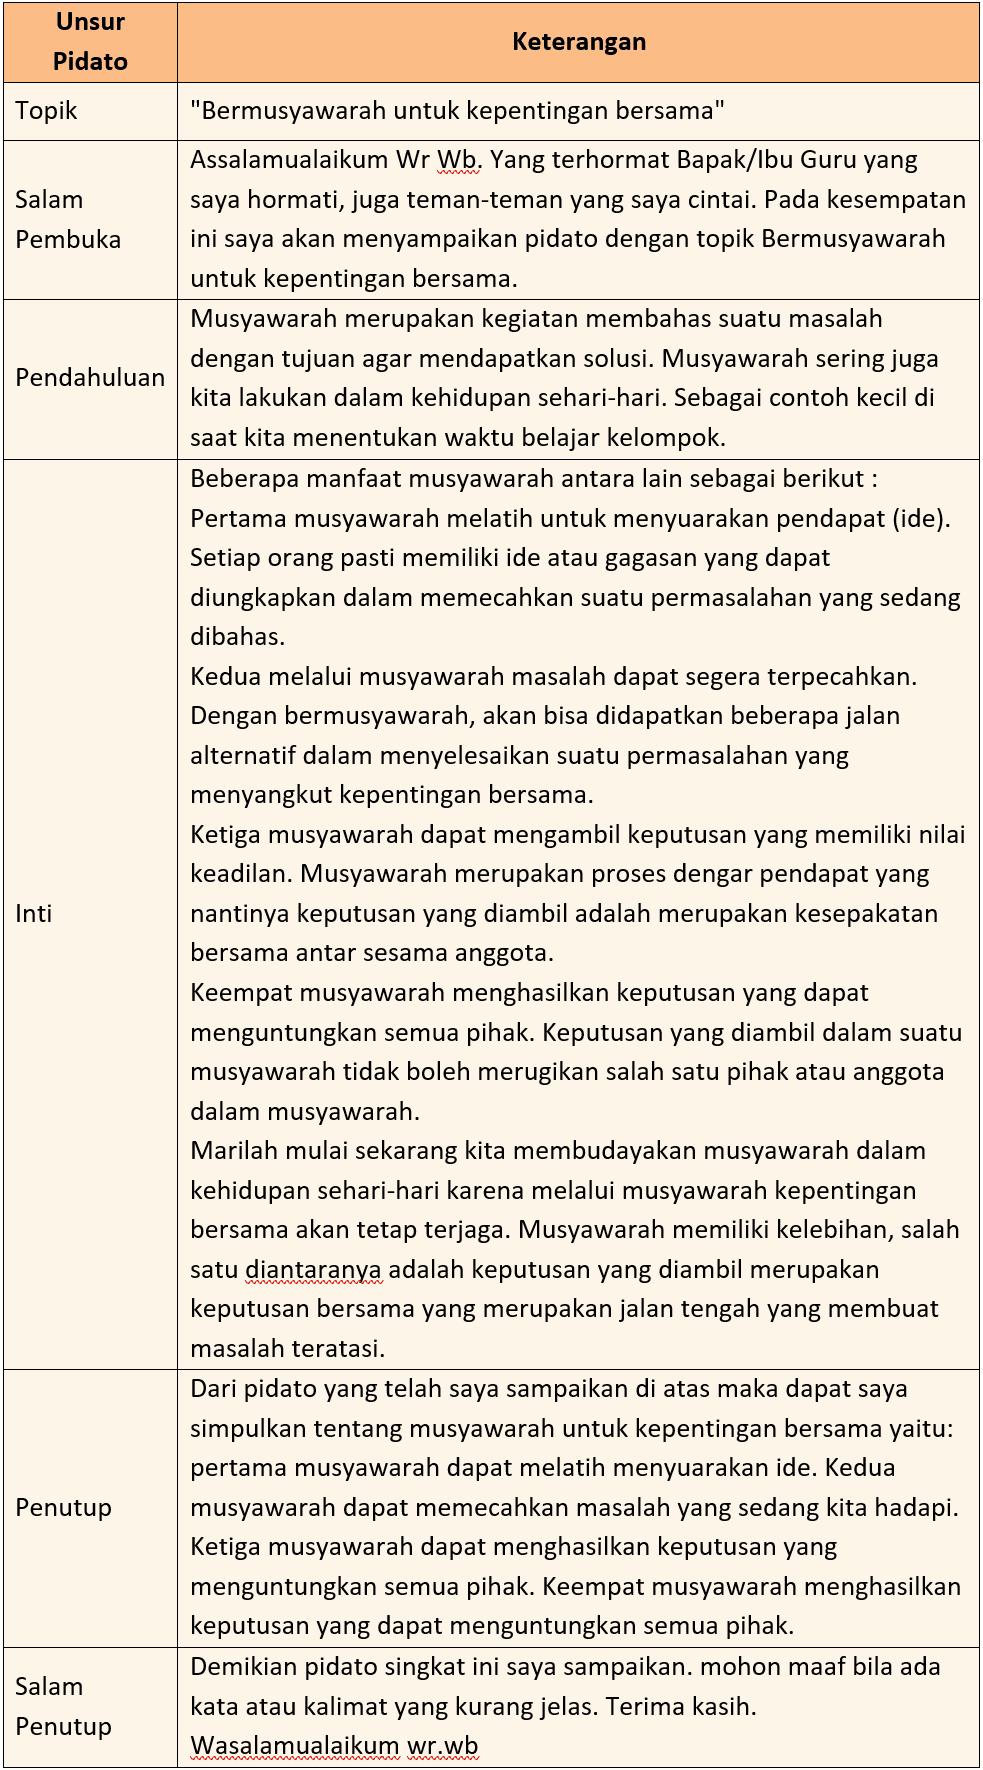 Kunci Jawaban Halaman 120, 121, 122, 123, 124 Tema 7 Kelas 6